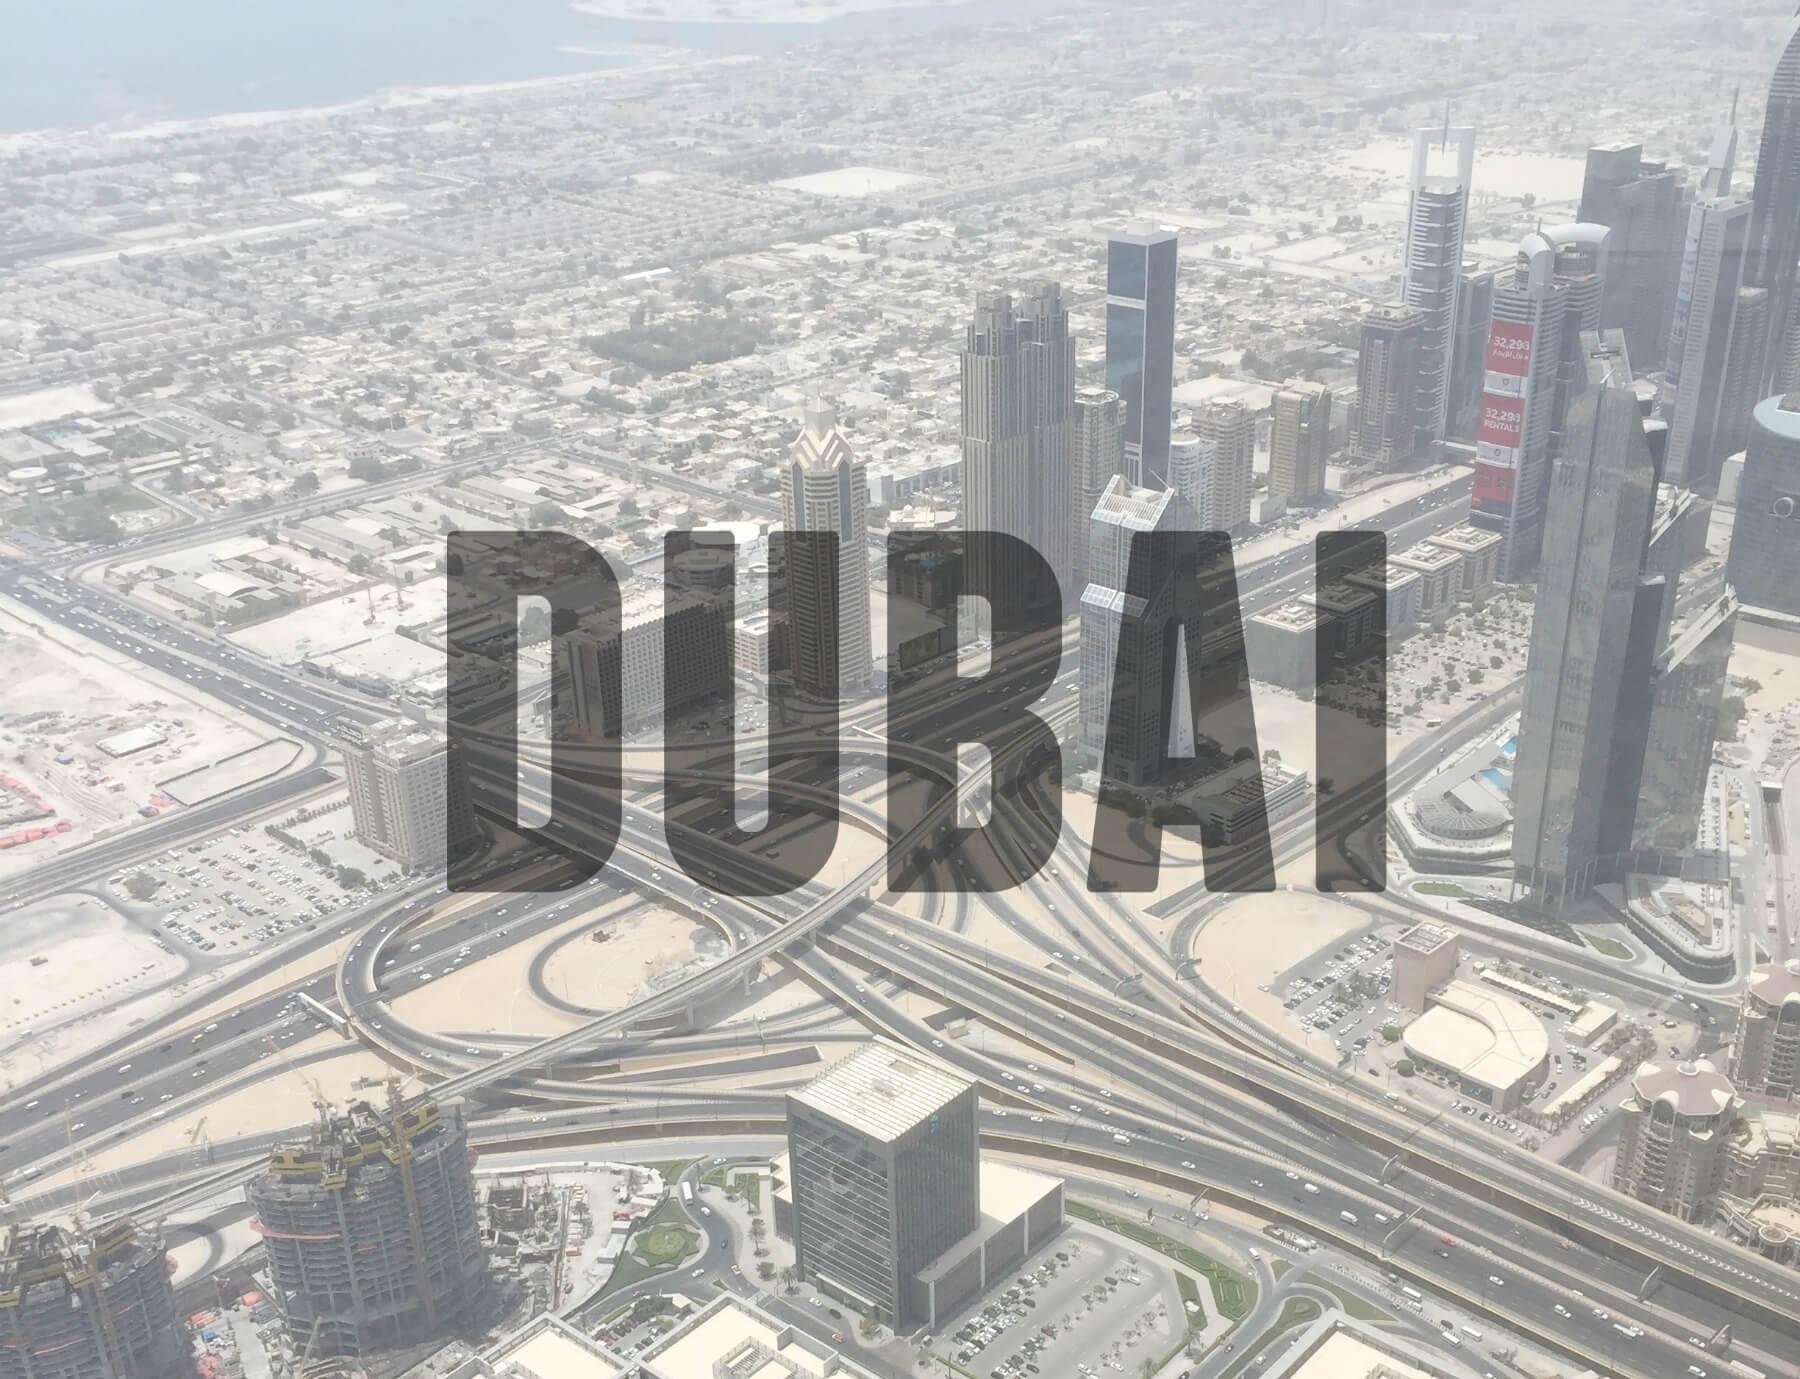 'DUBAI' (View from top of Burj Khalifa)